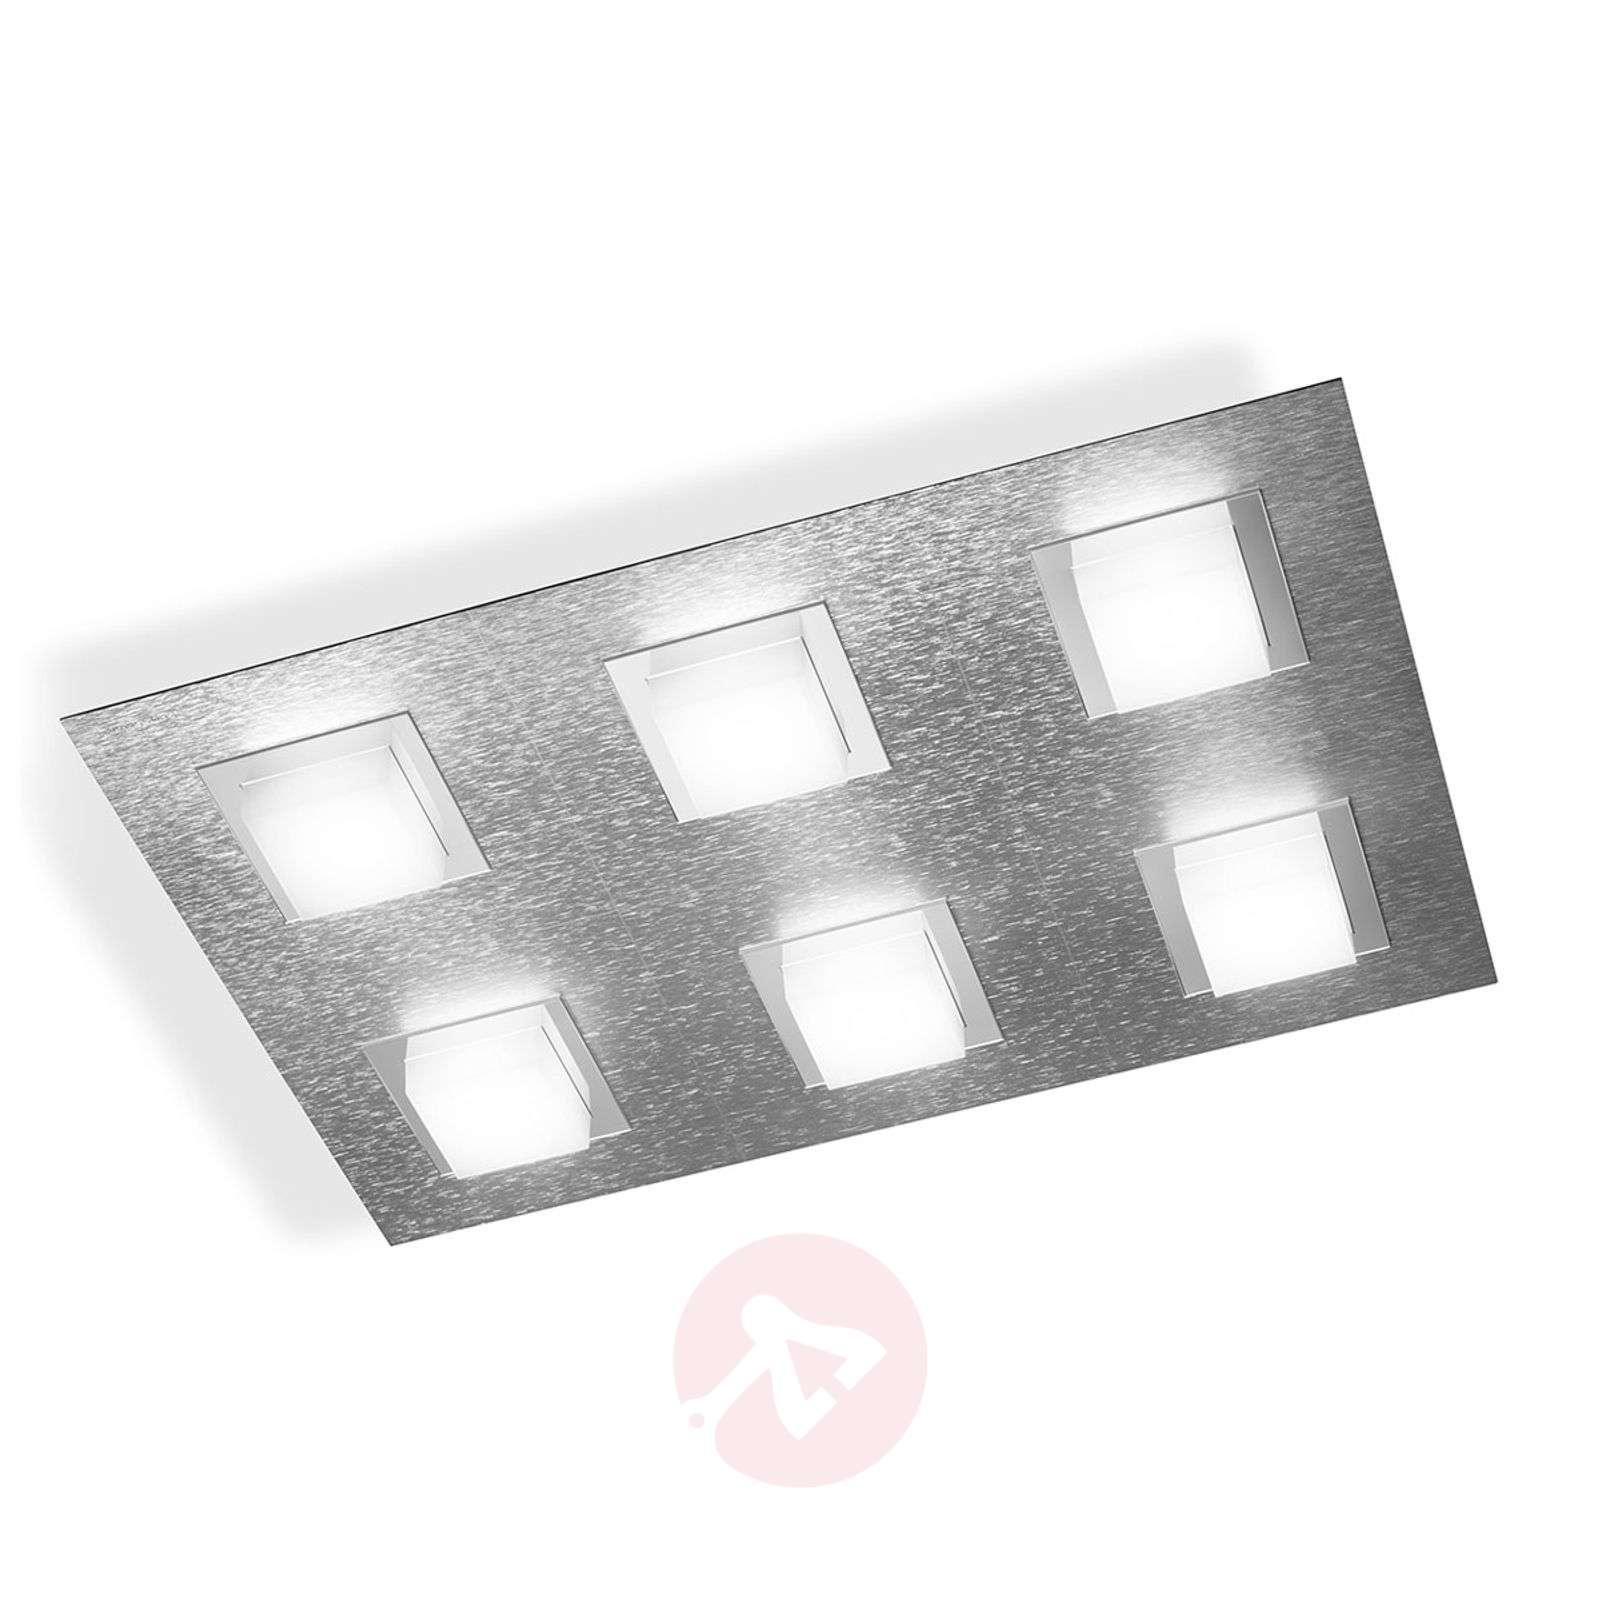 GROSSMANN Basic LED-kattovalaisin, 6-lamppuinen-4022062X-01